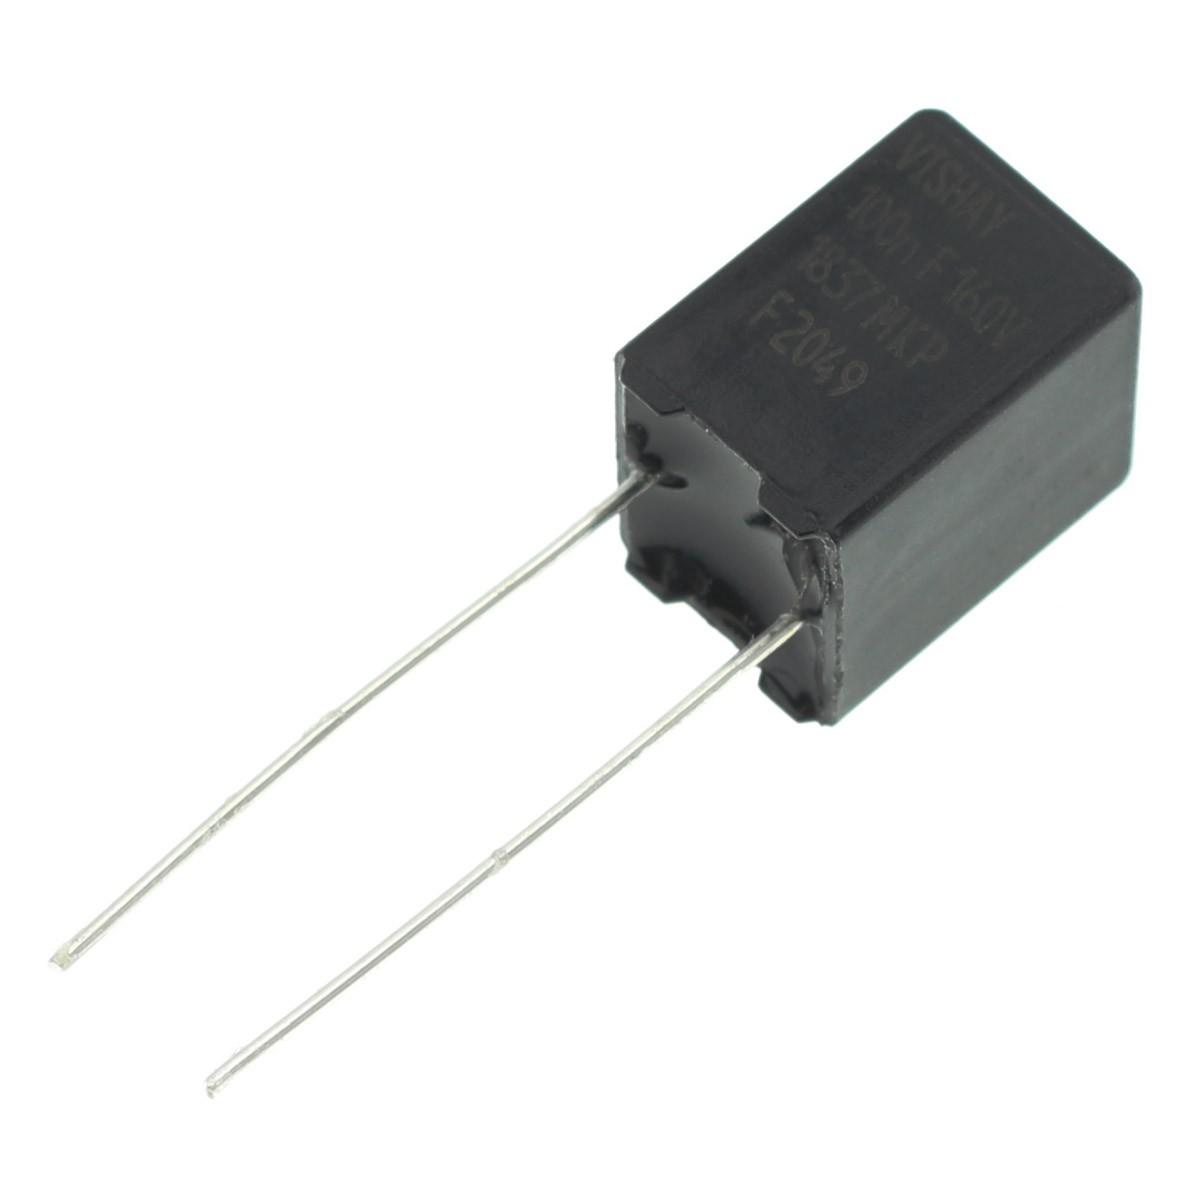 VISHAY ERO MKP1837 Condensateur Polypropylène 5mm 160V 0.1µF